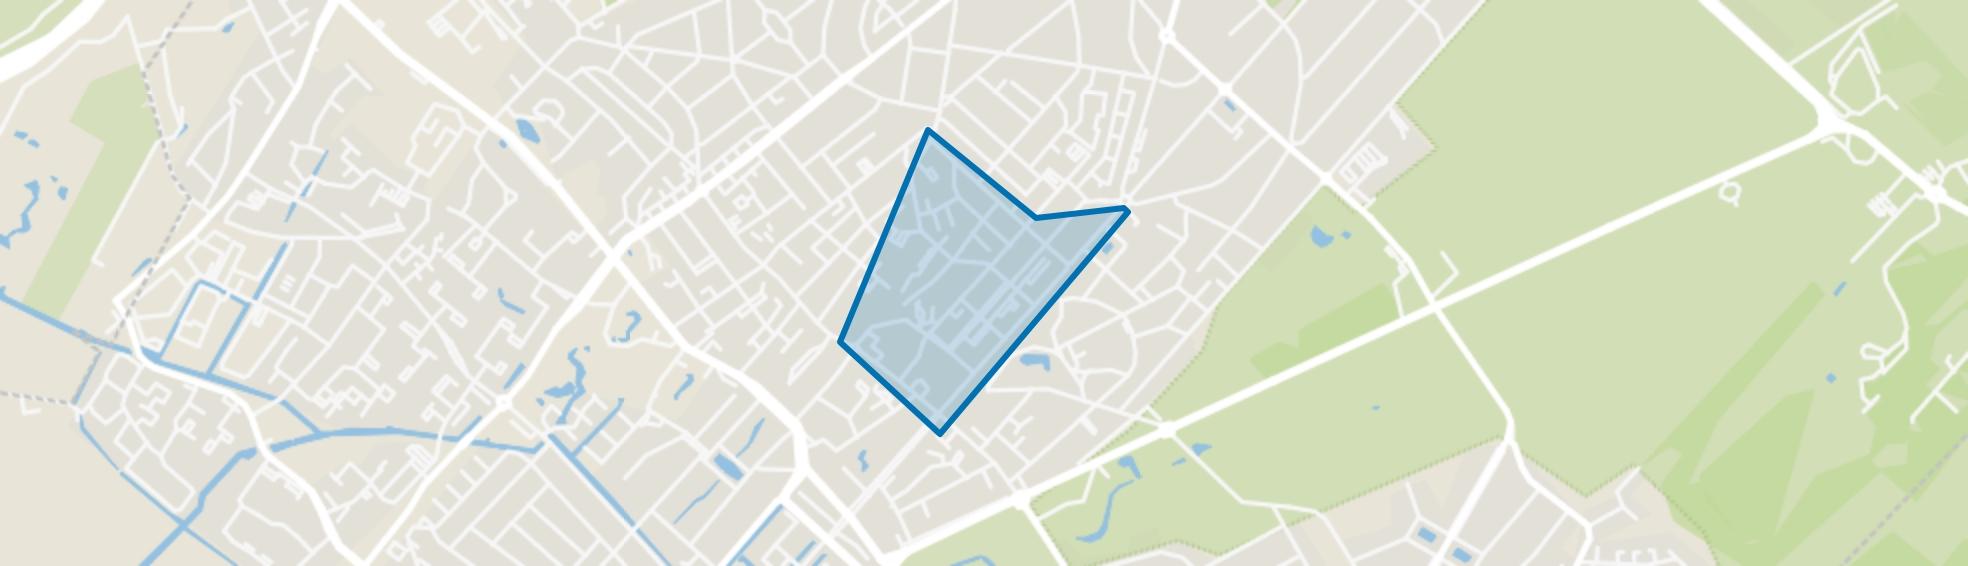 Carré, Zeist map